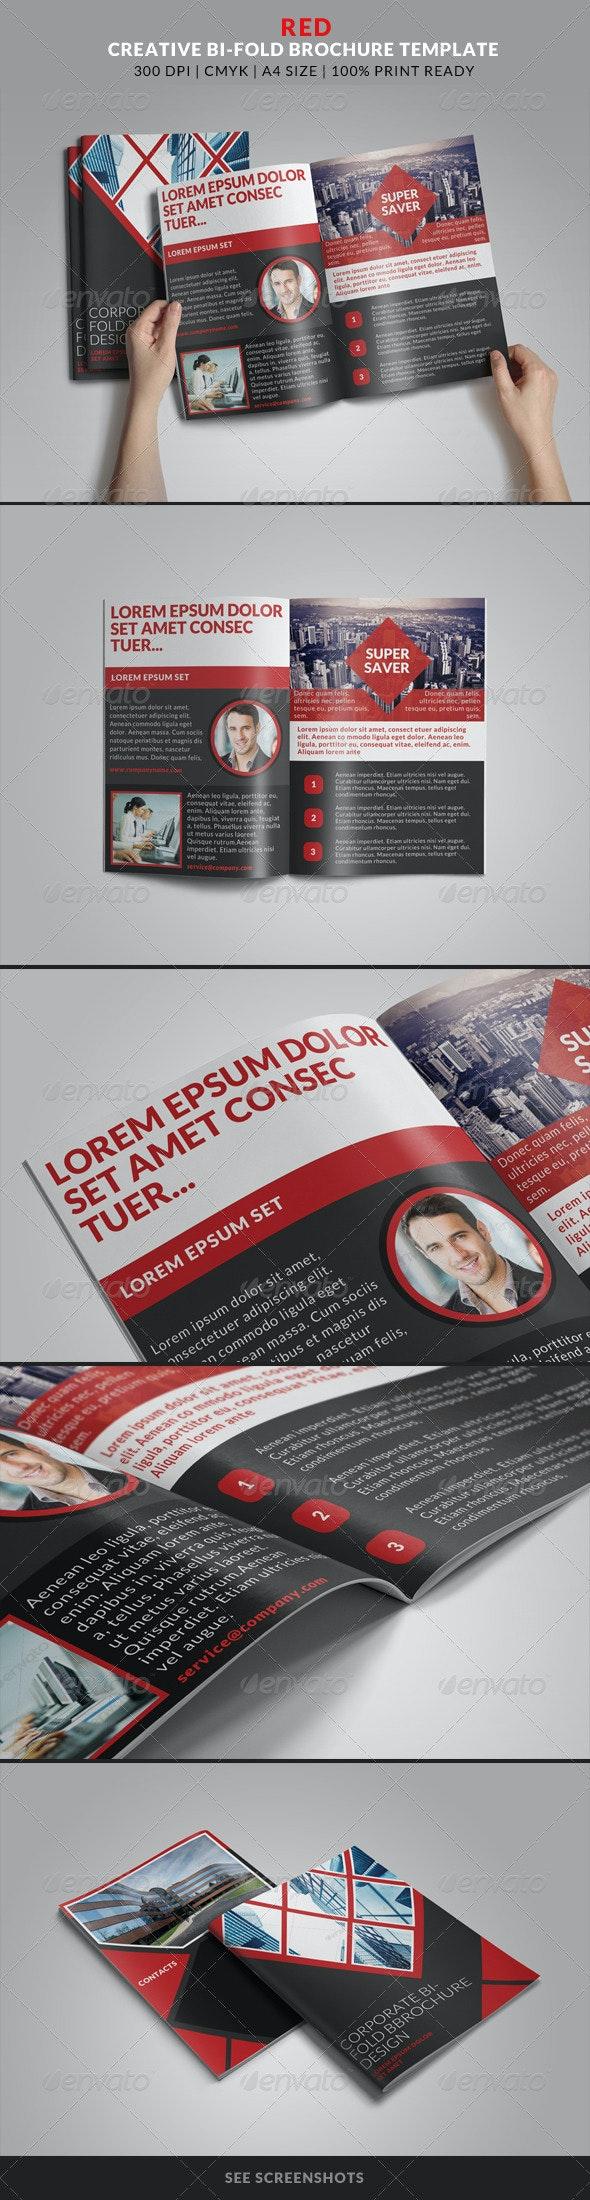 Red Creative Bi-Fold Brochure Template - Creative Business Cards